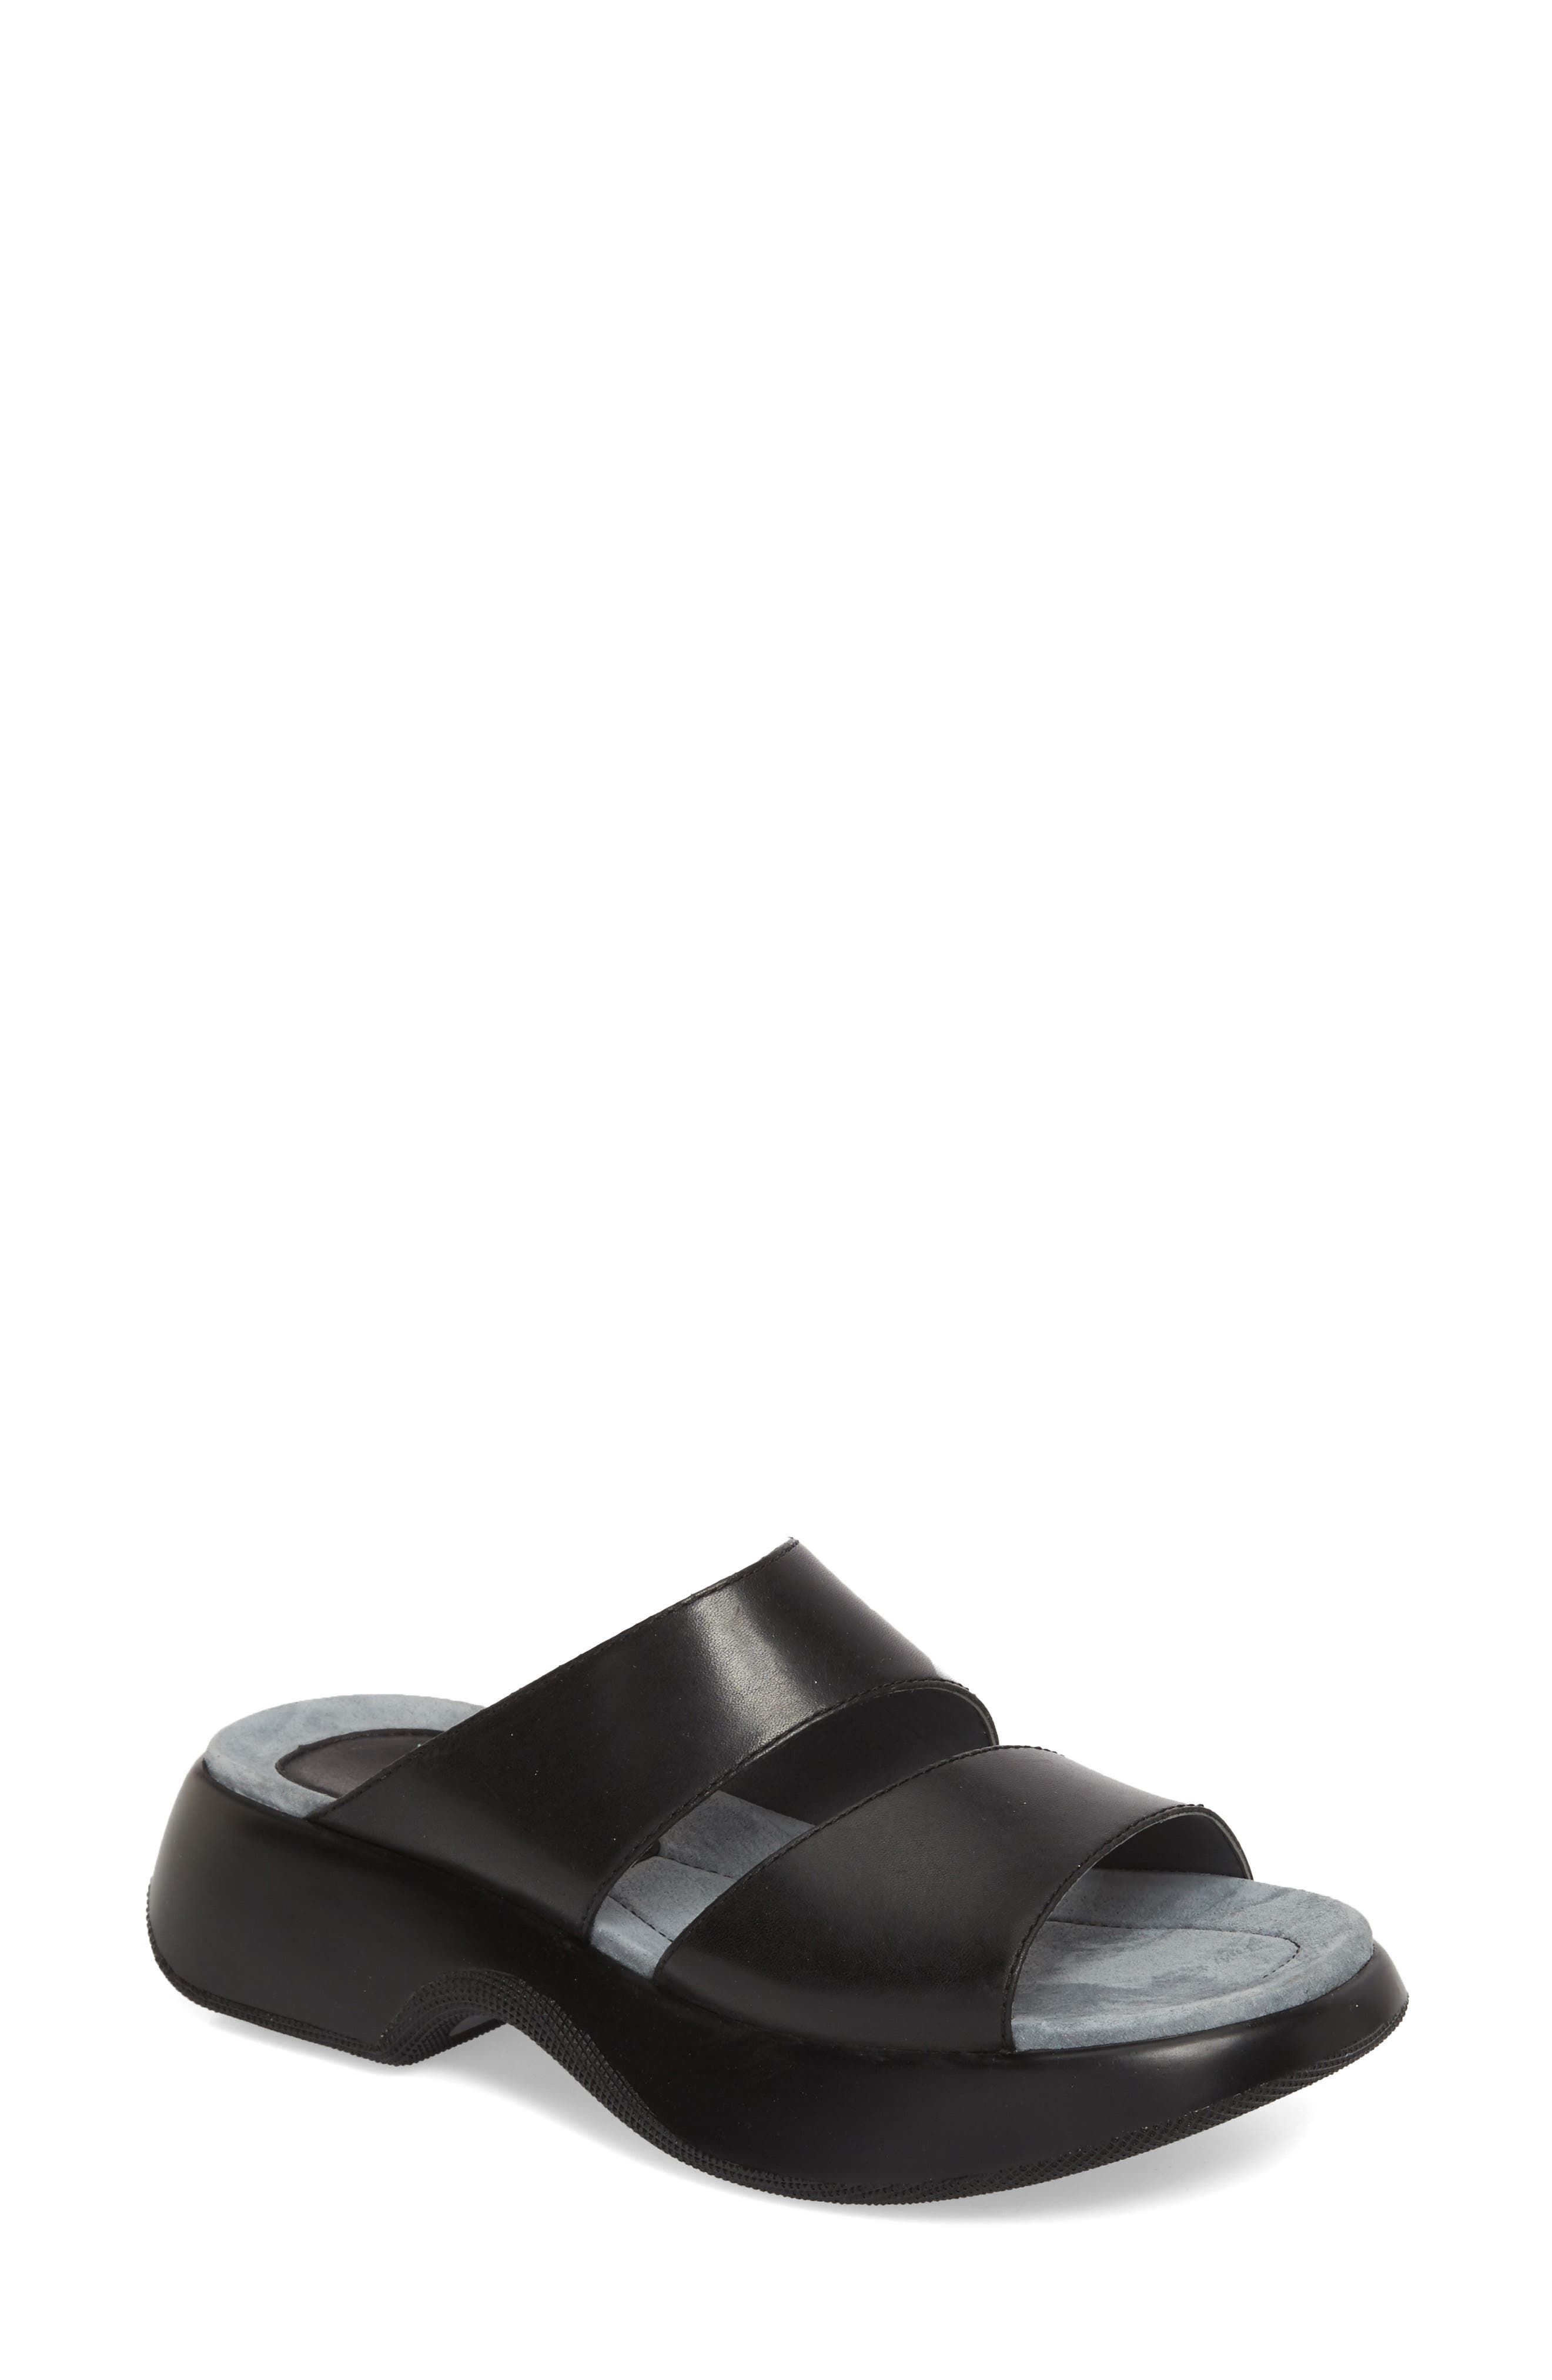 Lana Slide Sandal,                         Main,                         color, 001